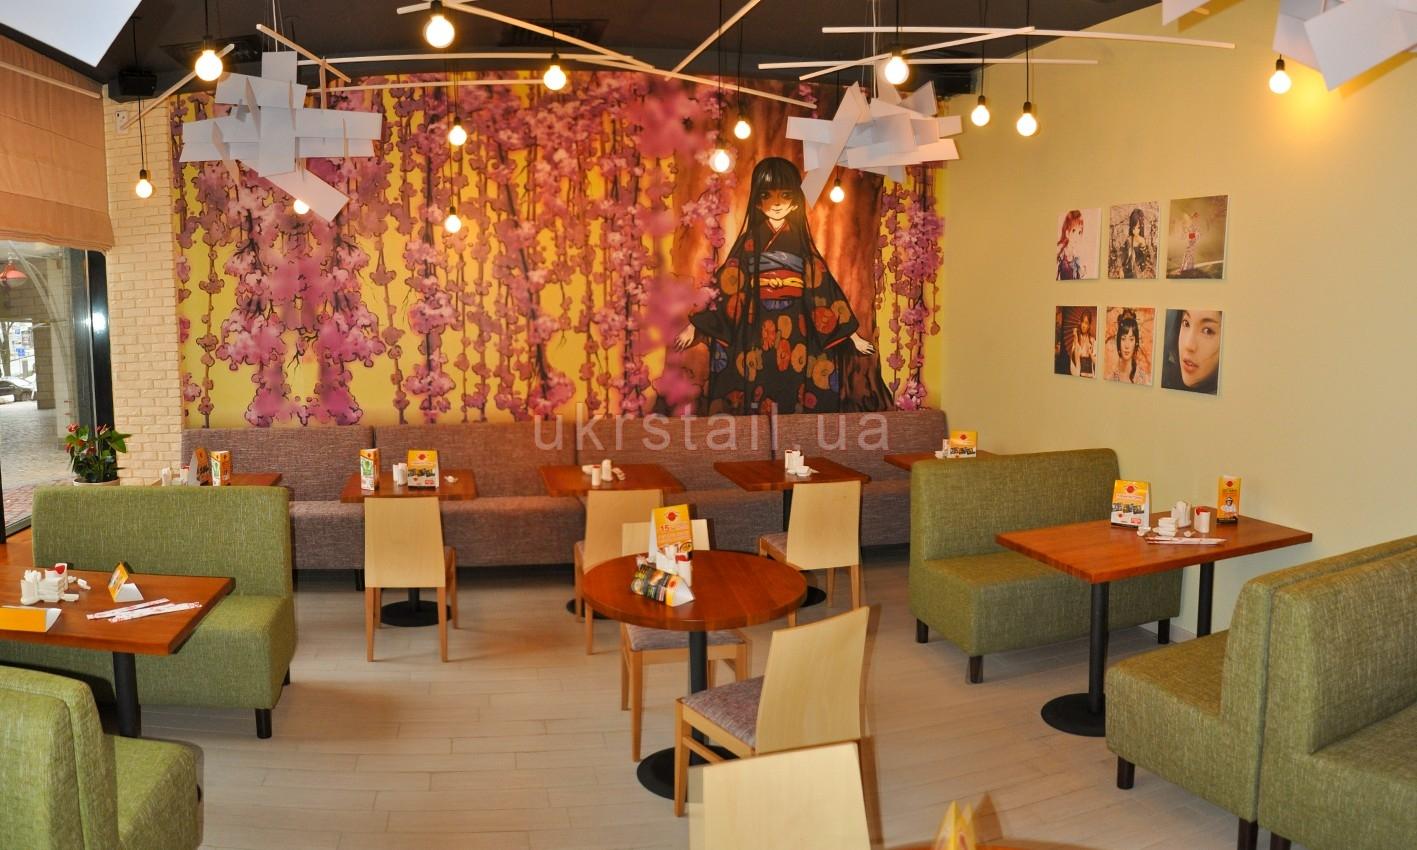 Мягкая мебель ресторана Мураками Киев 07